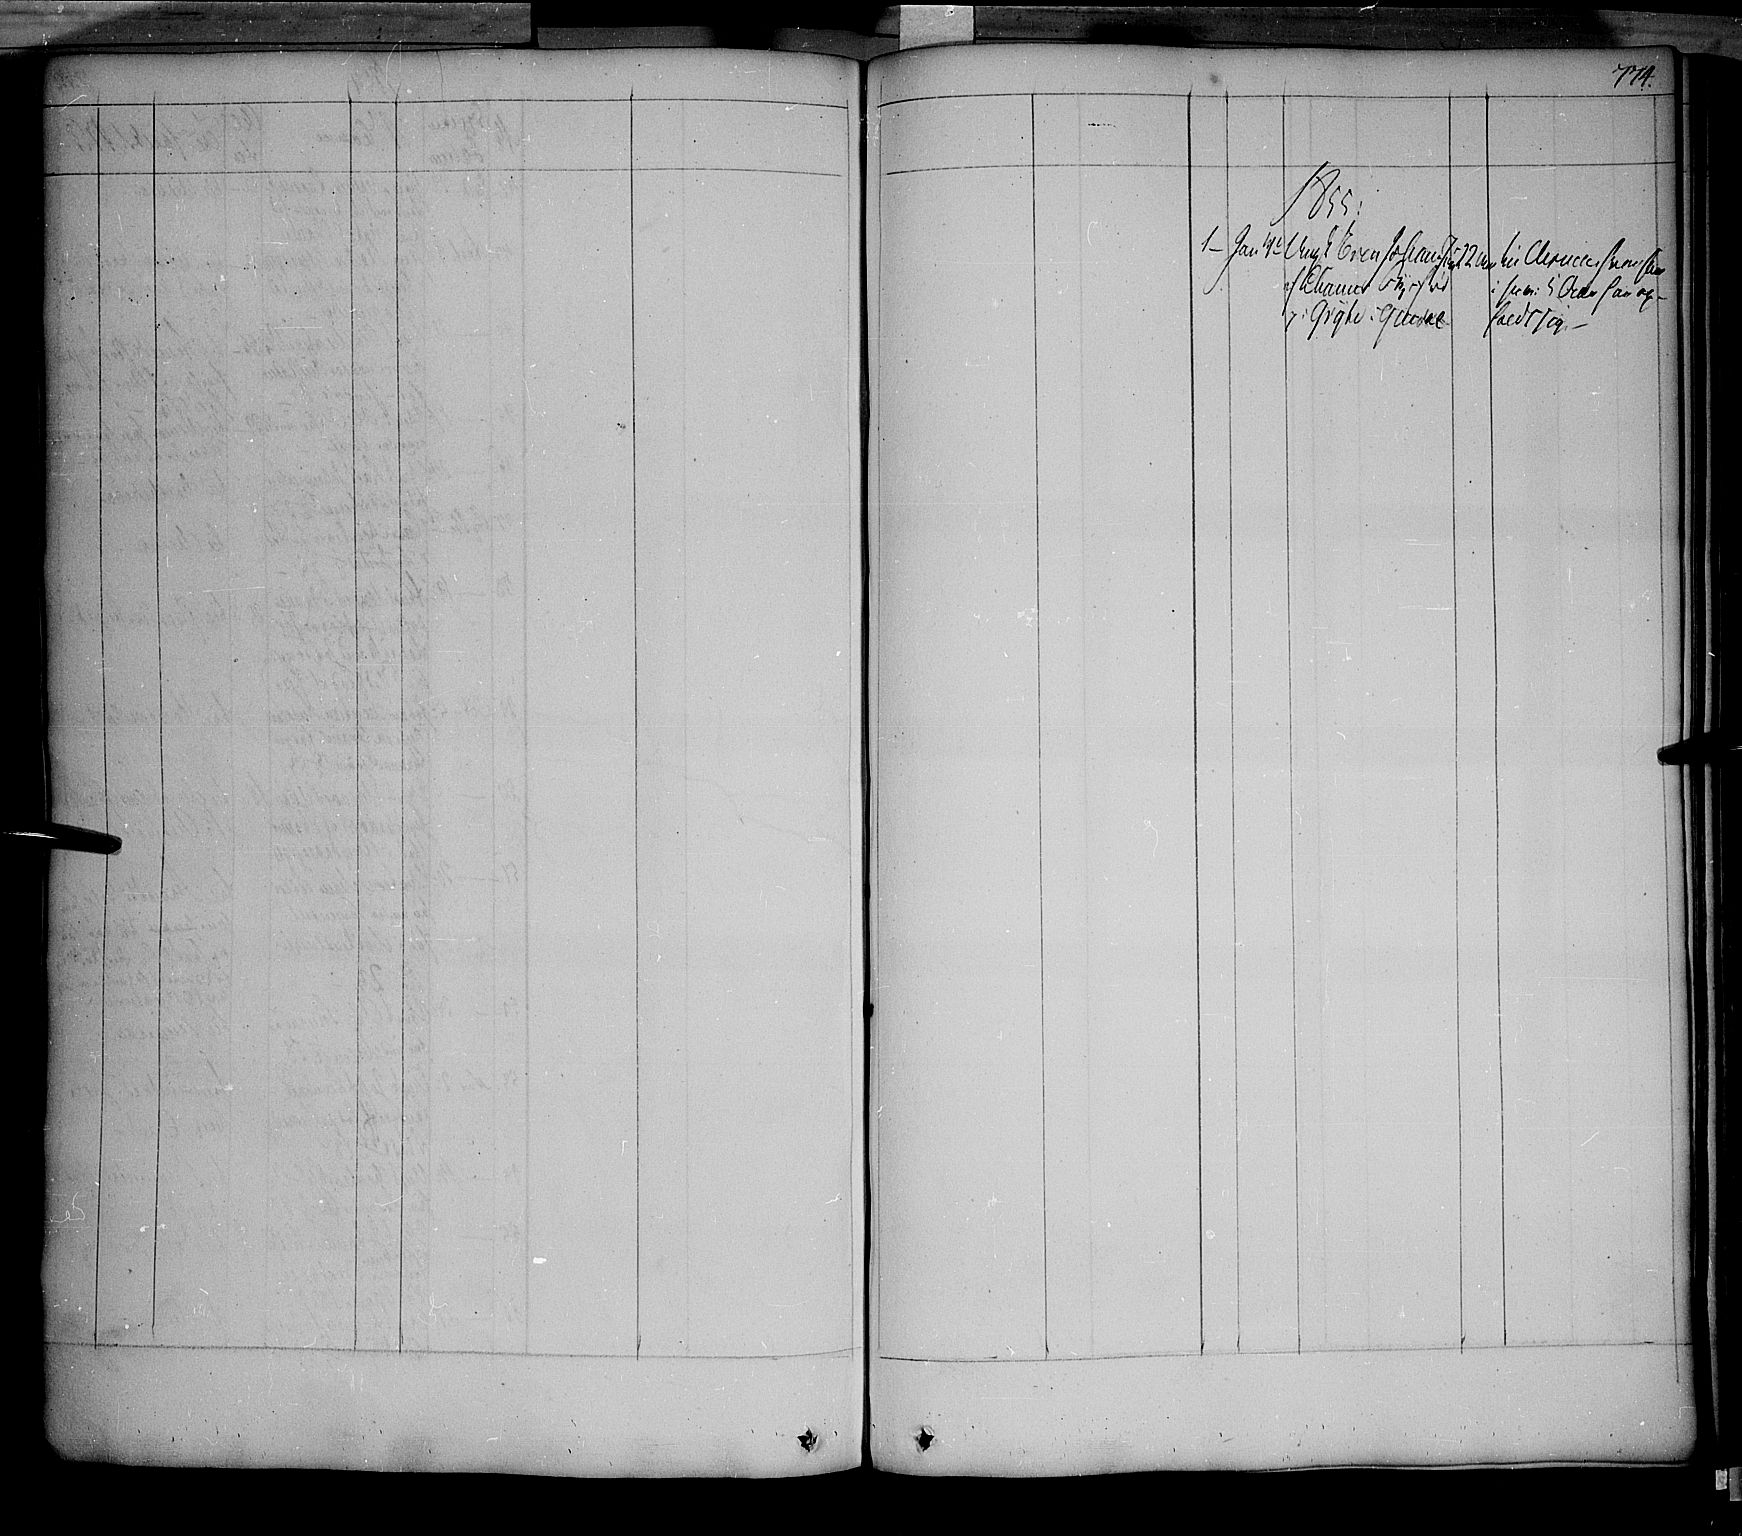 SAH, Fåberg prestekontor, Ministerialbok nr. 5, 1836-1854, s. 773-774